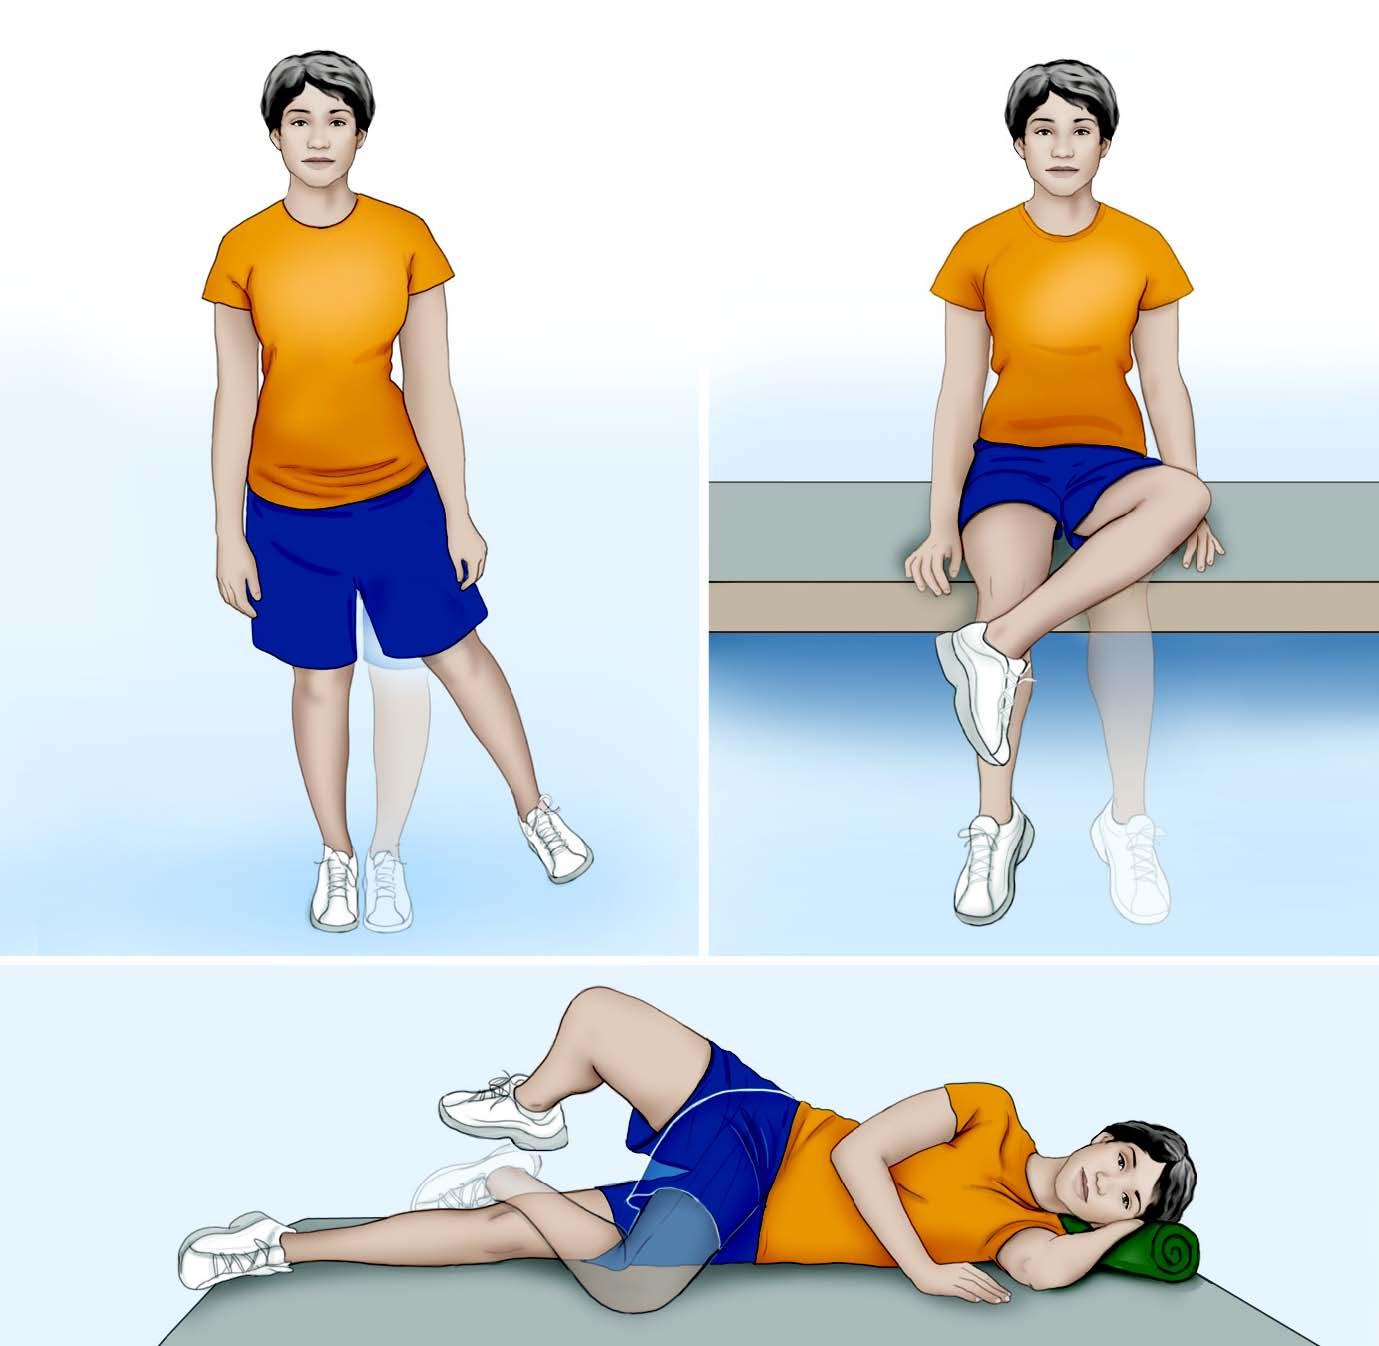 Balance Board Exercises For Knee: Balance Exercises: Balance Exercises Knee